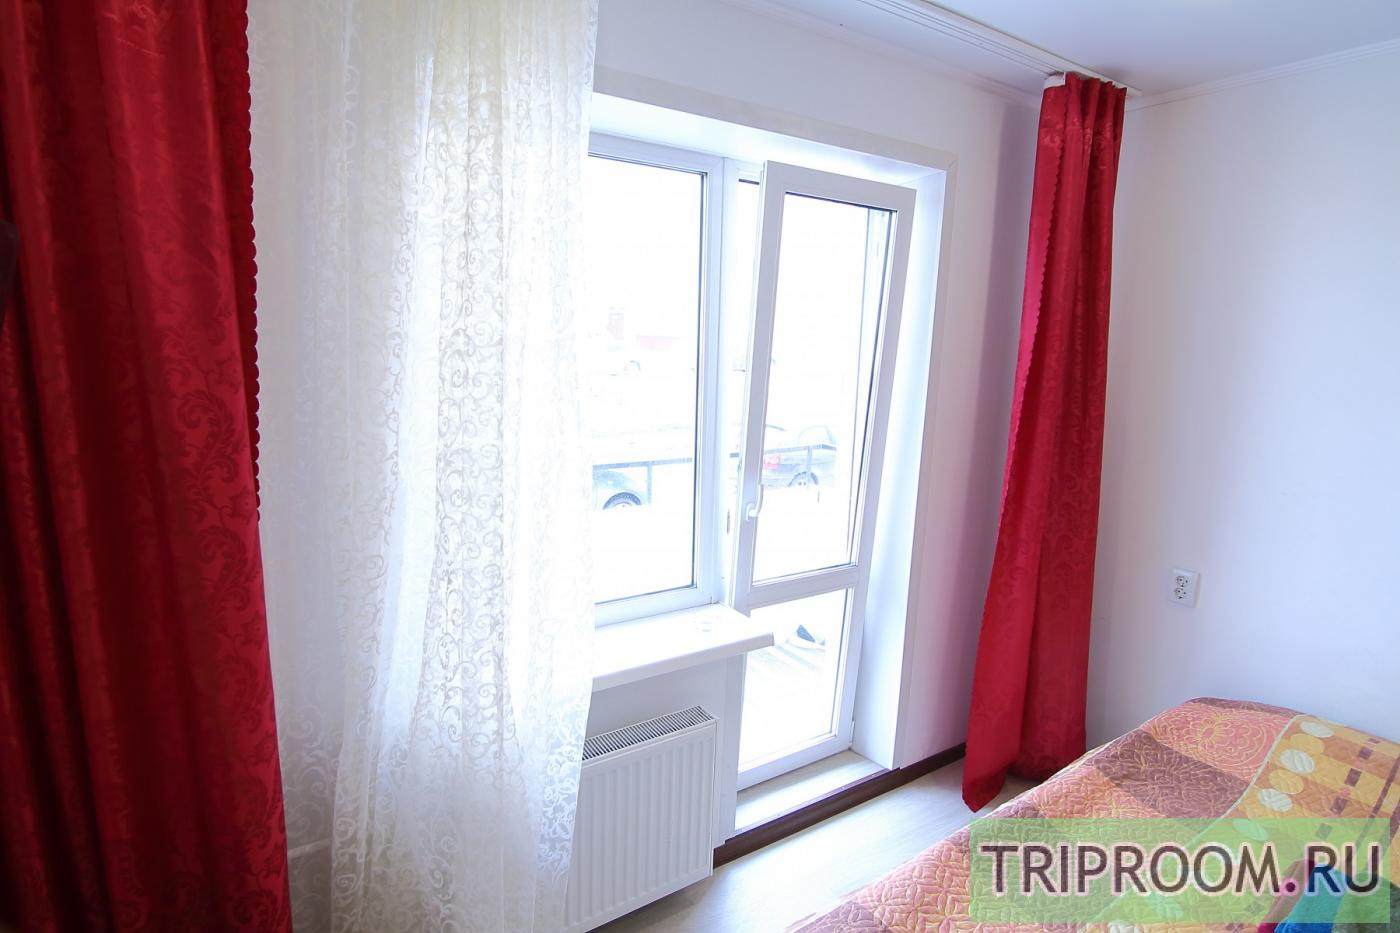 1-комнатная квартира посуточно (вариант № 10582), ул. Романа Брянского улица, фото № 4